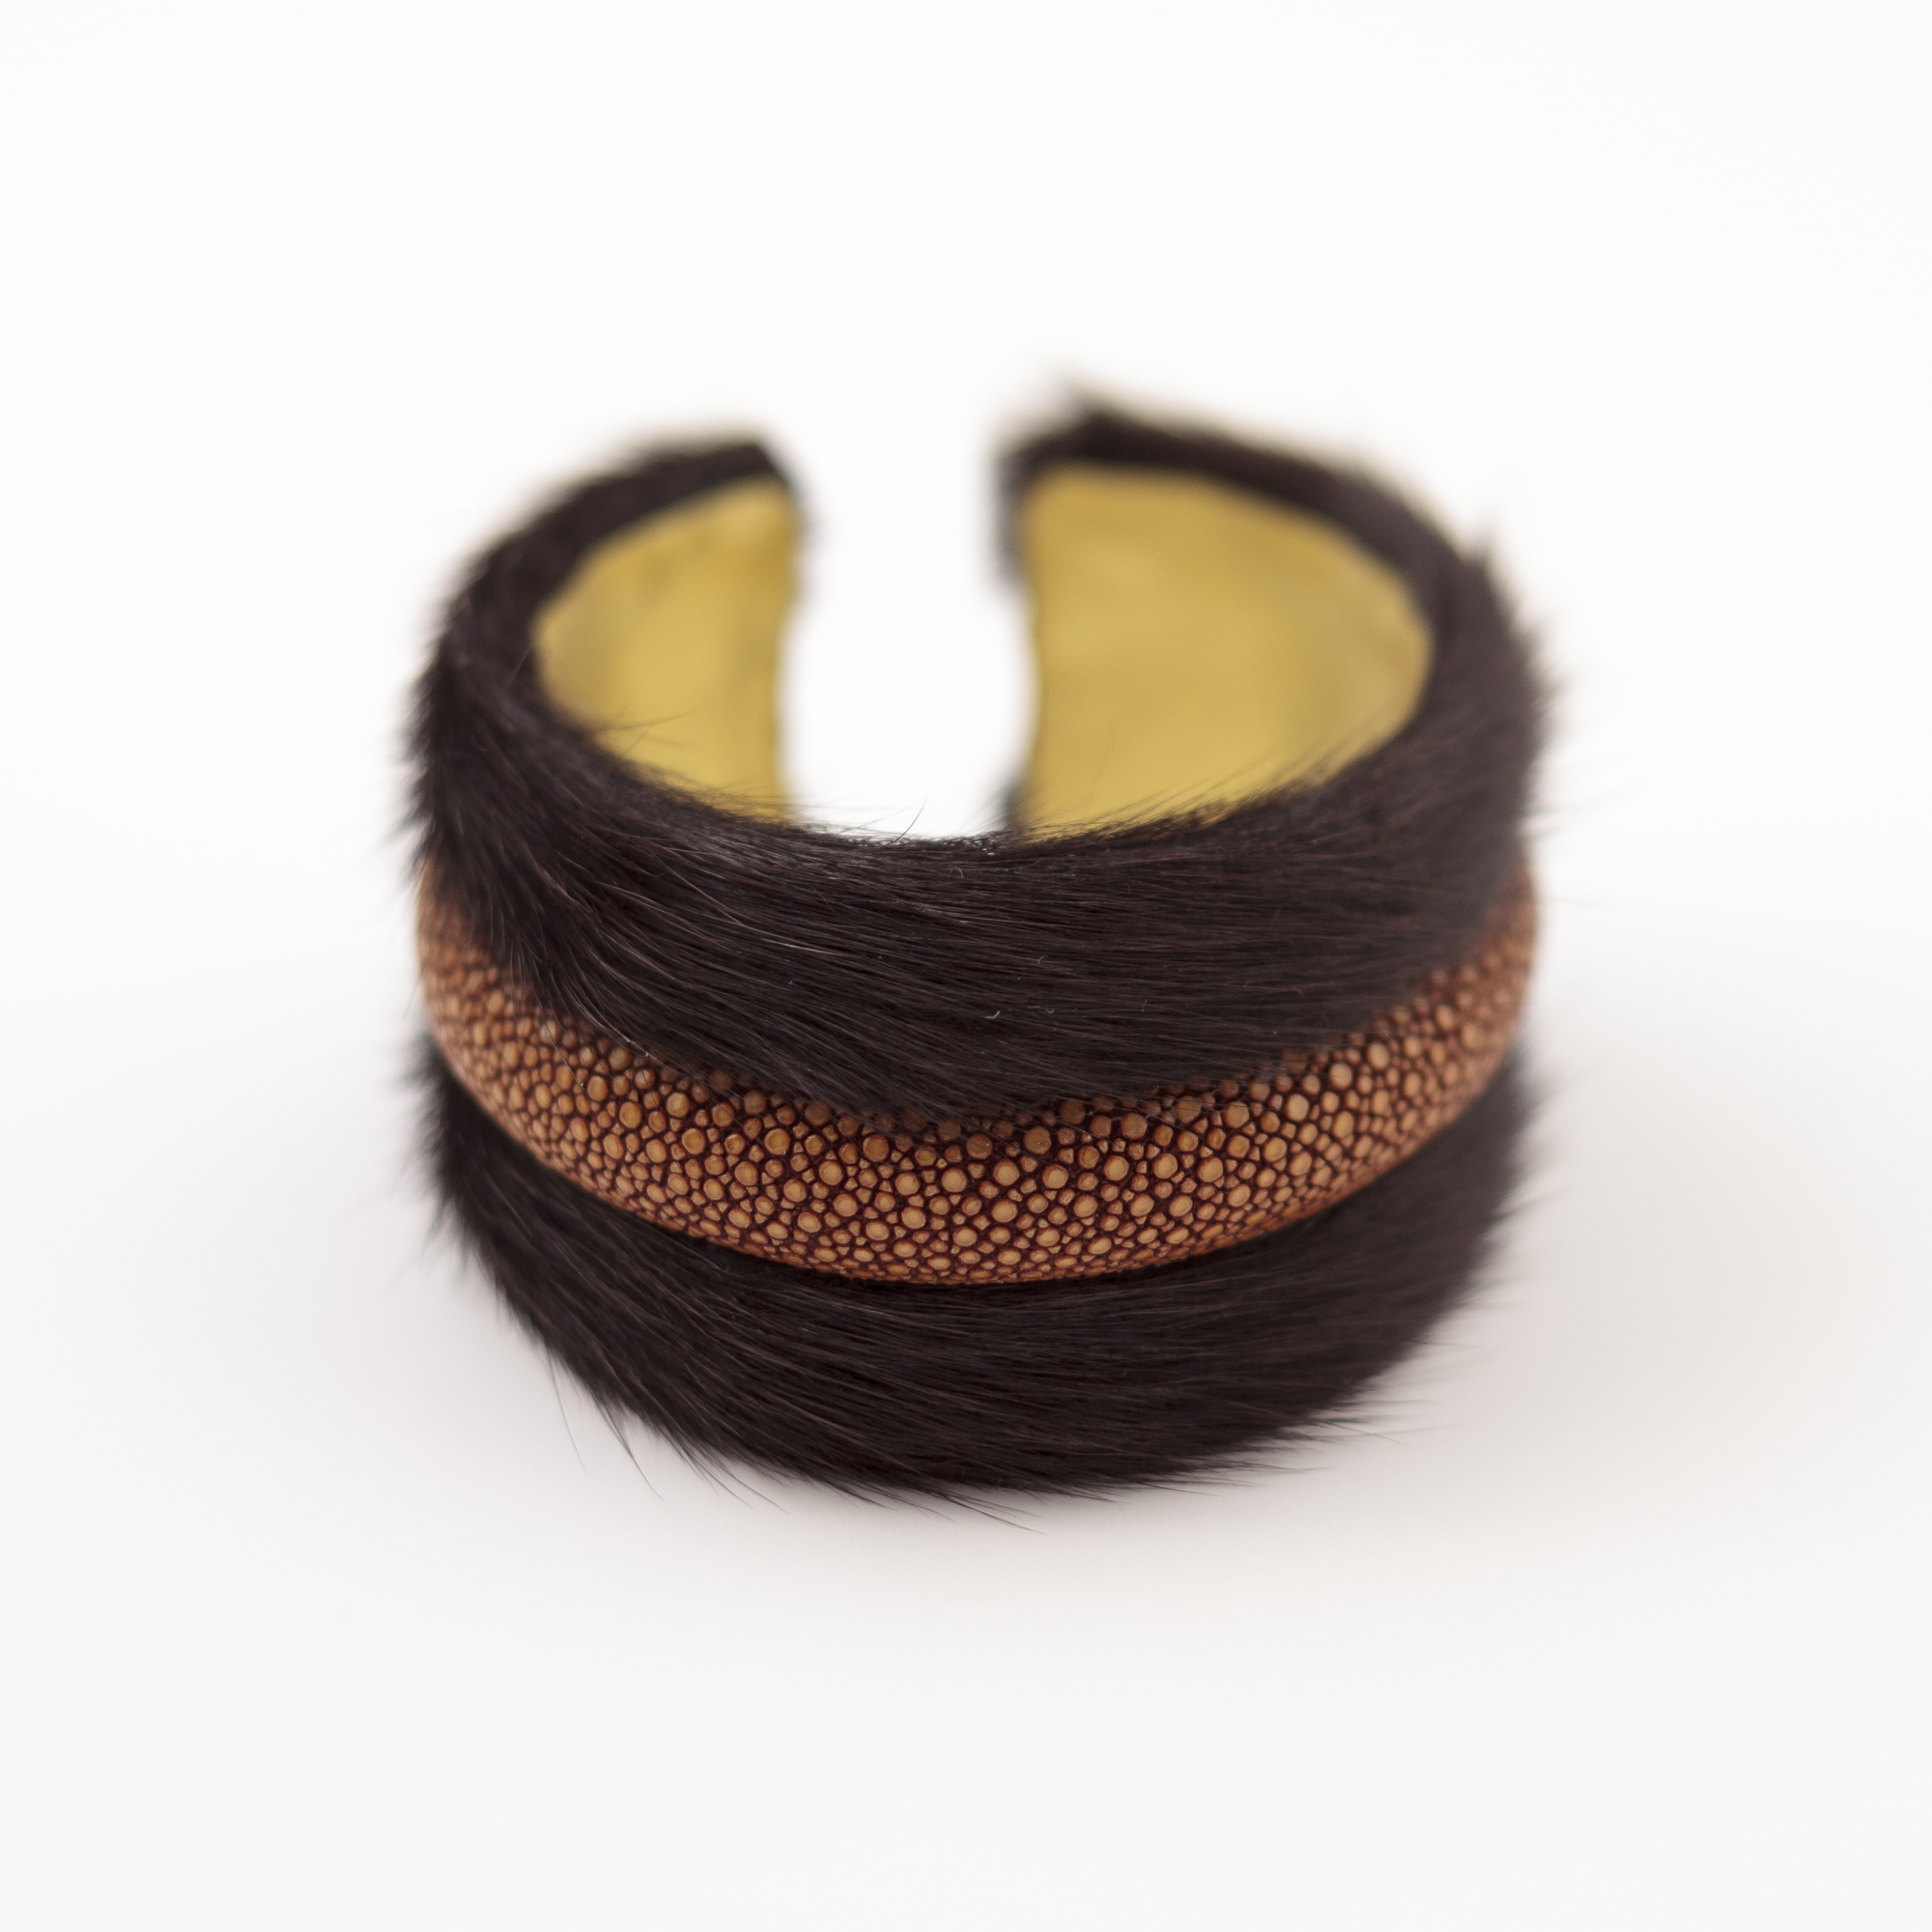 tresor-by-flore-galuchat-bracelet-poilu-brun-moutarde